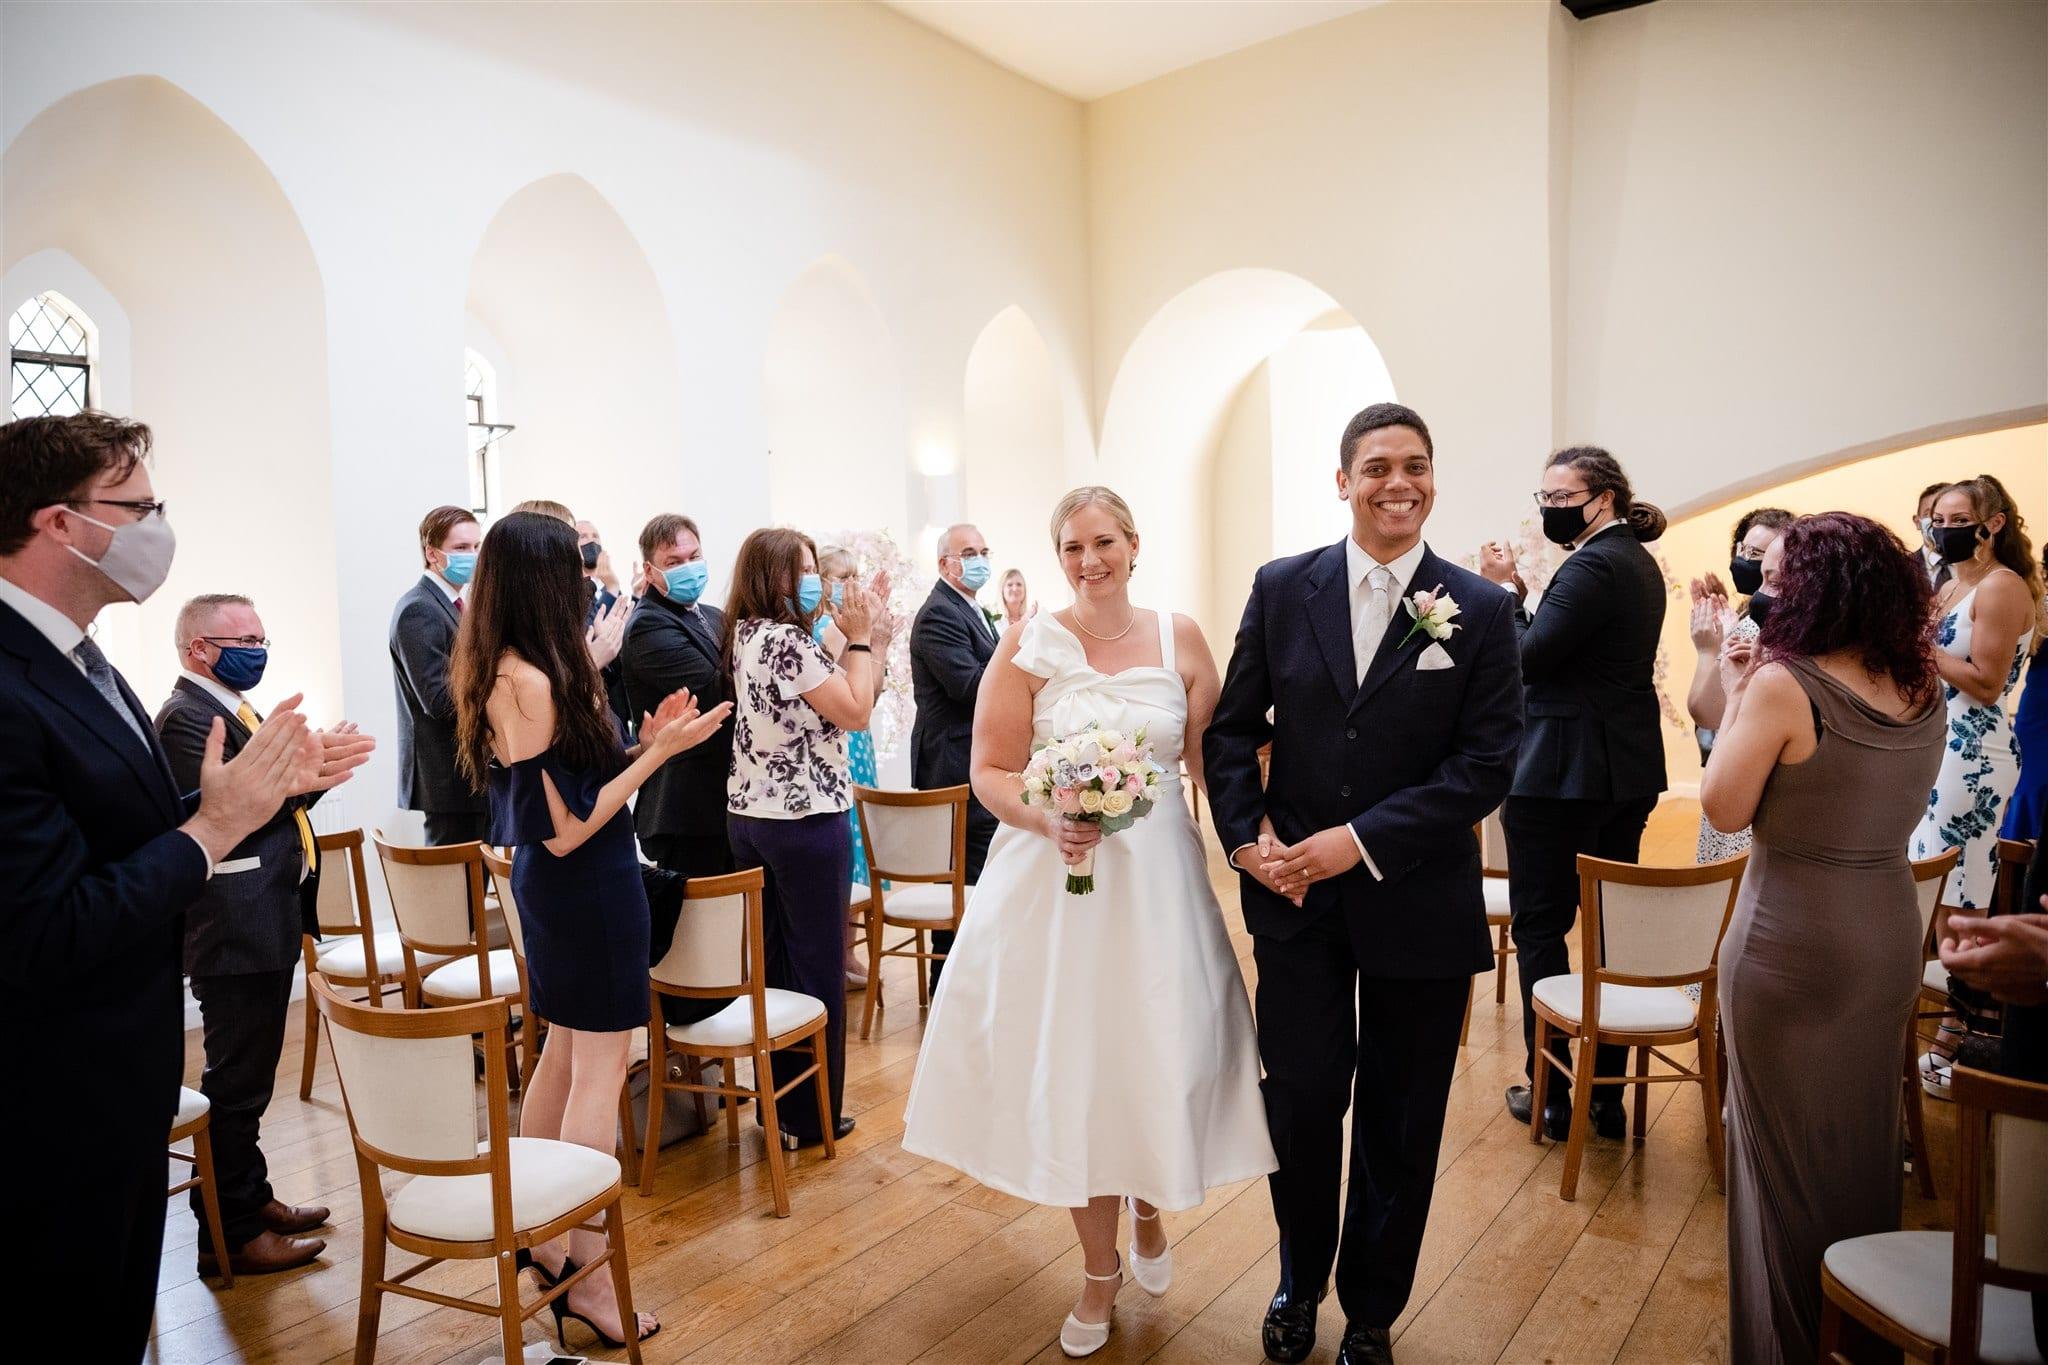 Wedding ceremony after Covid19 closure in Surrey